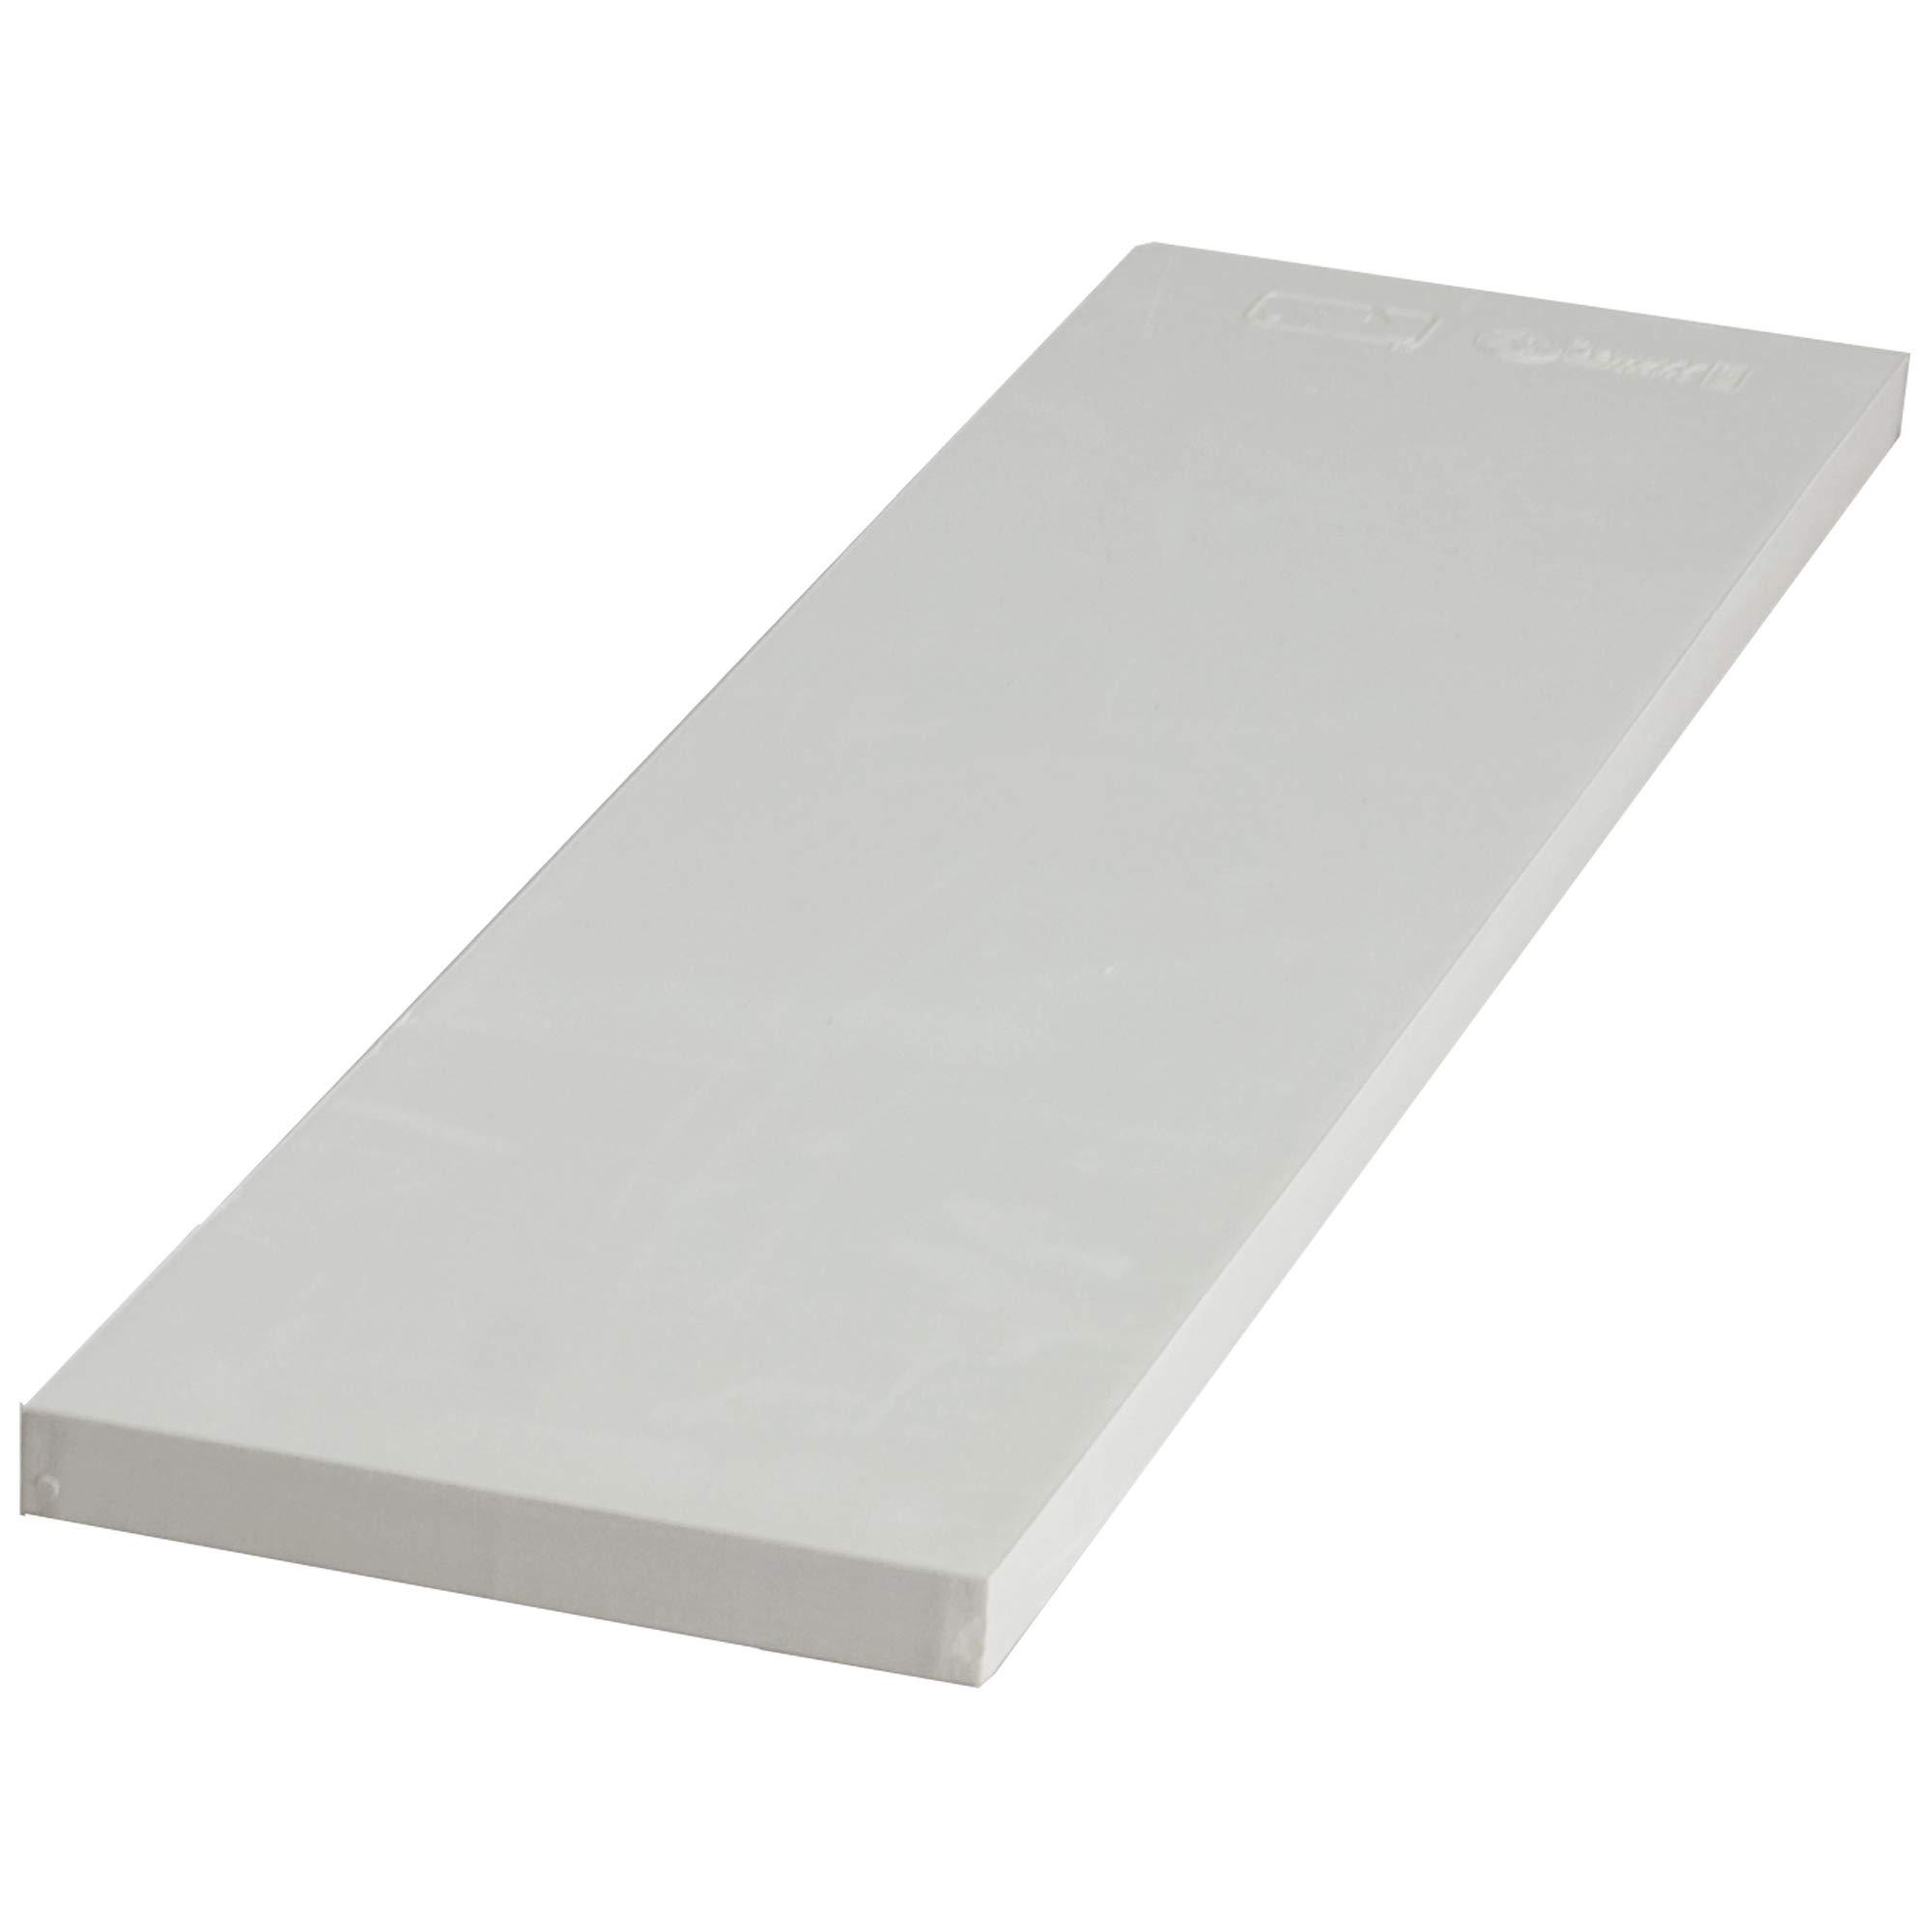 Schutt Official Spike Installed Pitch Rubber (White, 6-Inch x 24-Inch) by Schutt